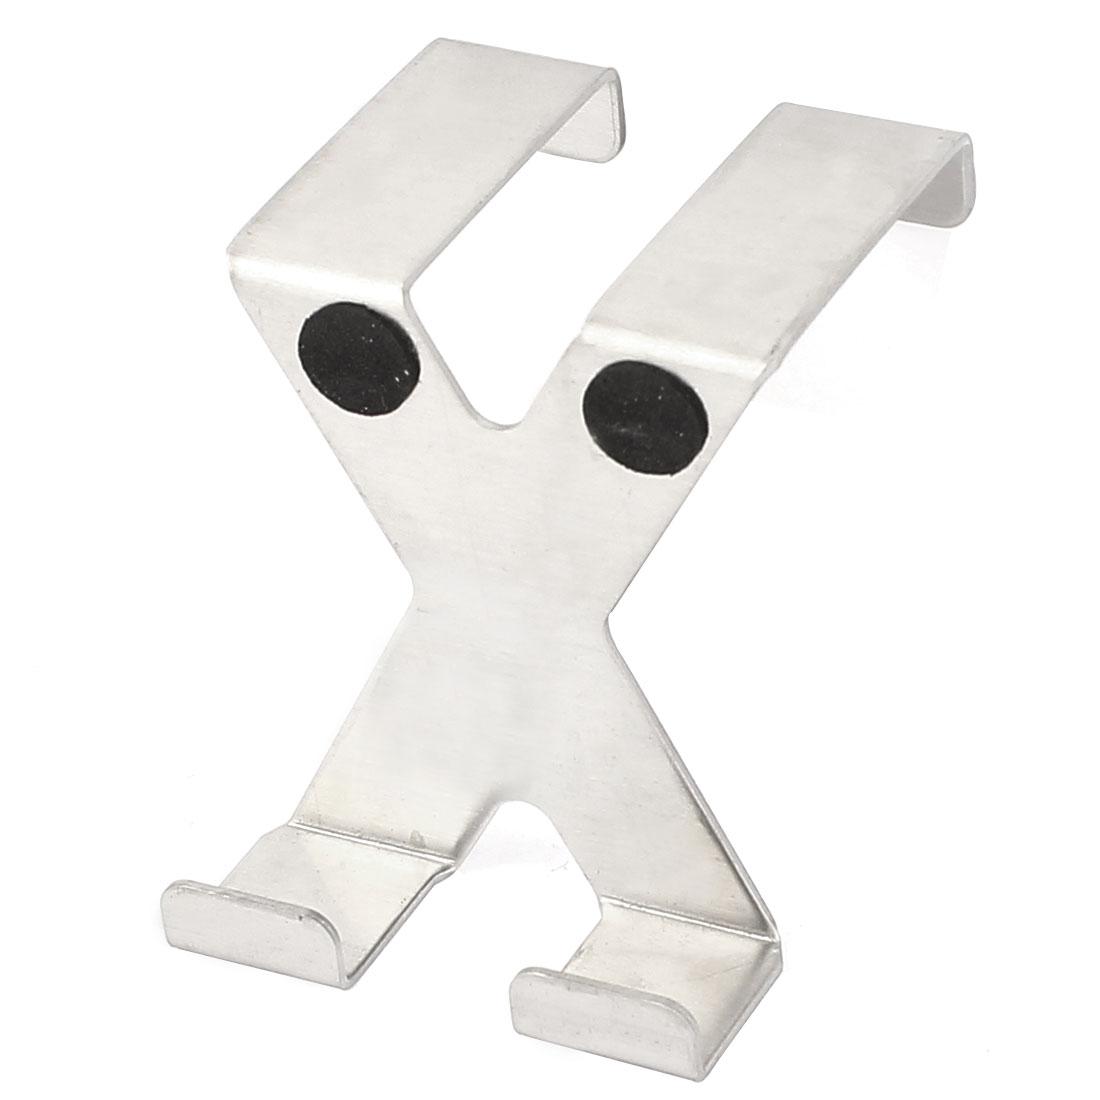 Household Bathroom Stainless Steel X Shaped Two Hangers Drawer Door Hook Silver Tone